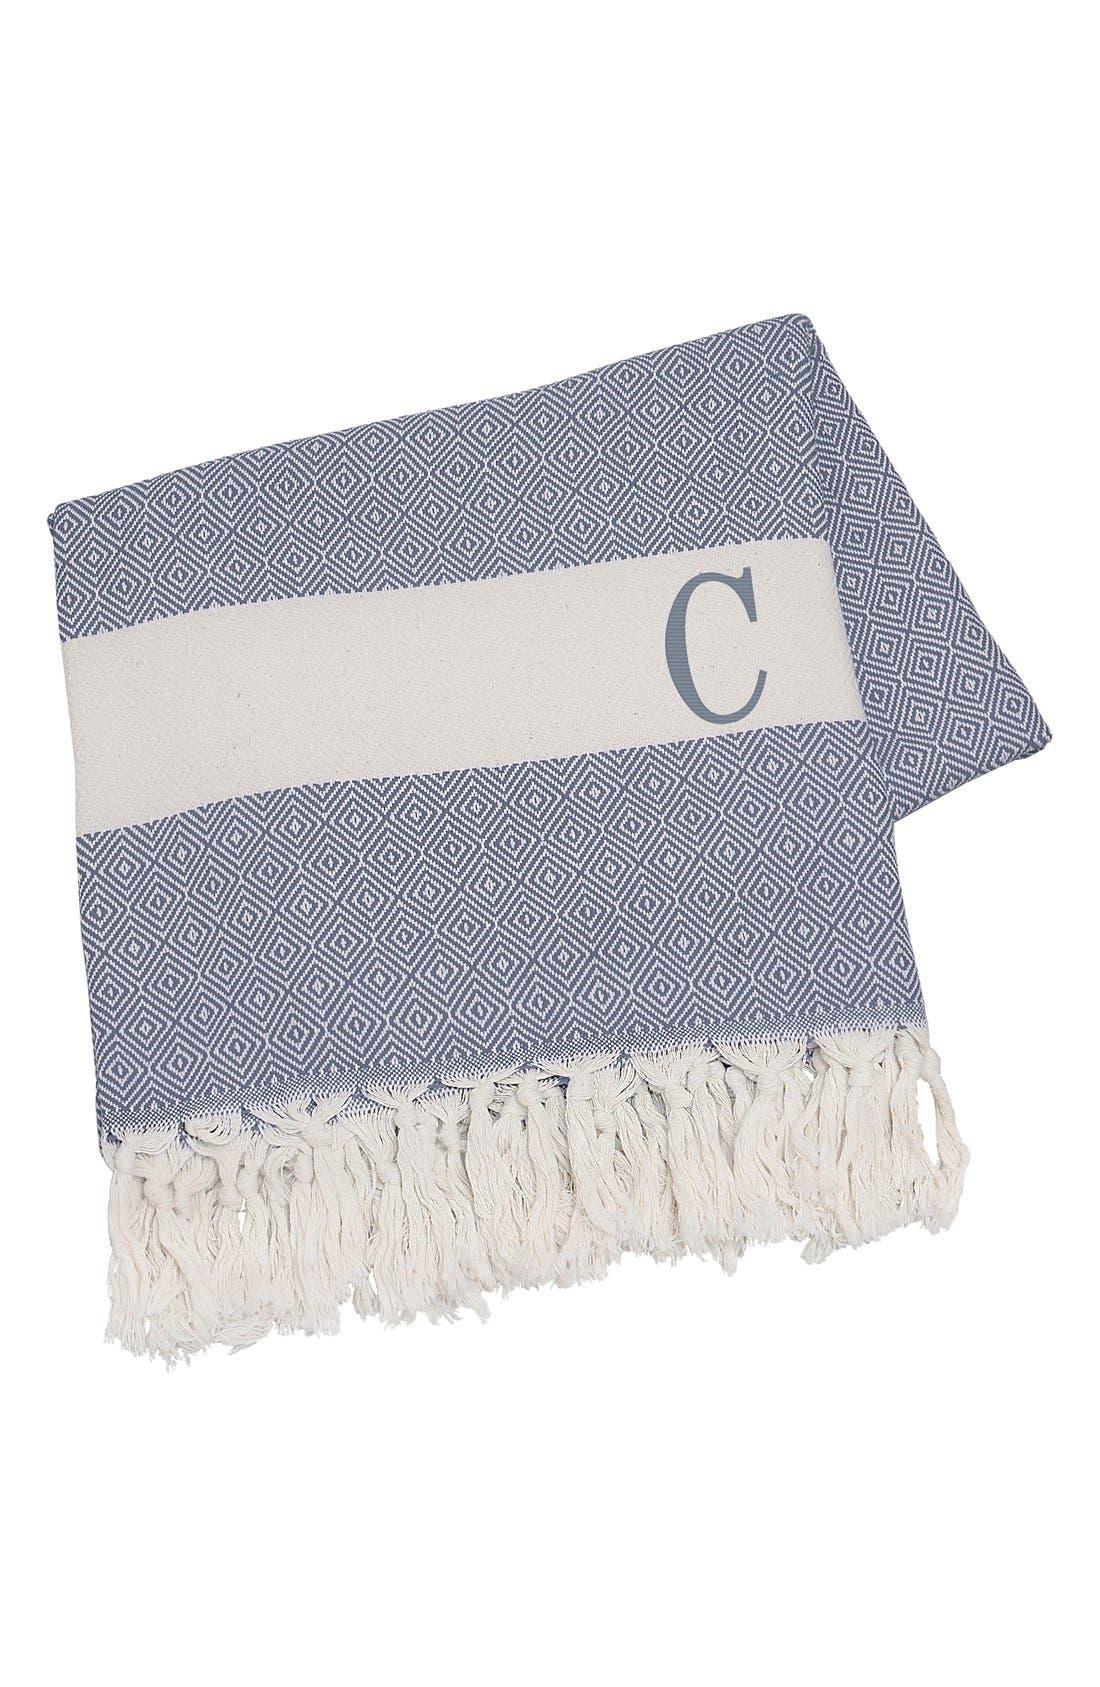 Main Image - Cathy's Concepts Monogram Turkish Cotton Throw